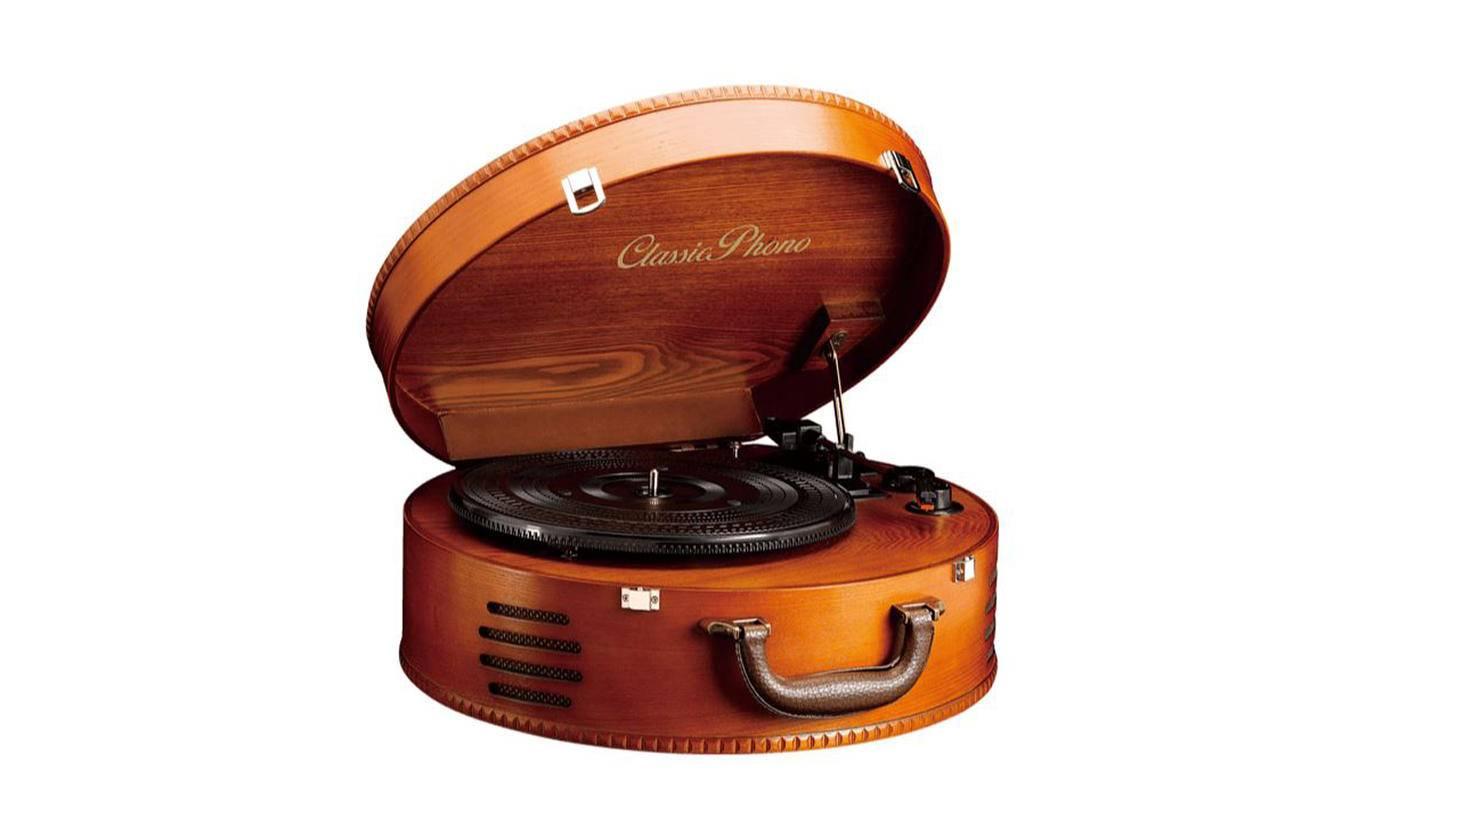 classic phono plattenspieler